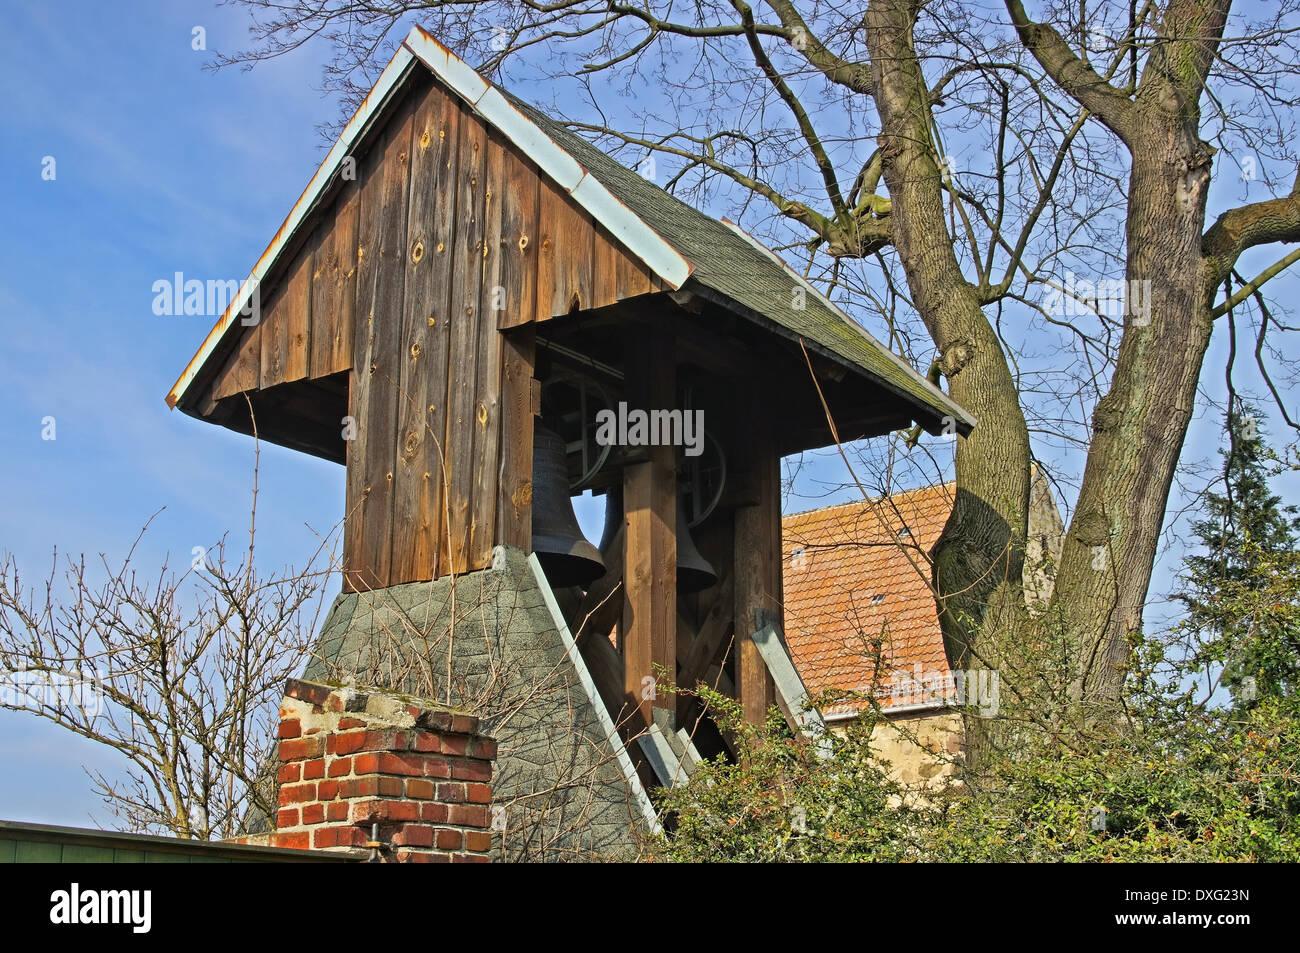 Waltersdorf Kirche - Waltersdorf church 01 - Stock Image